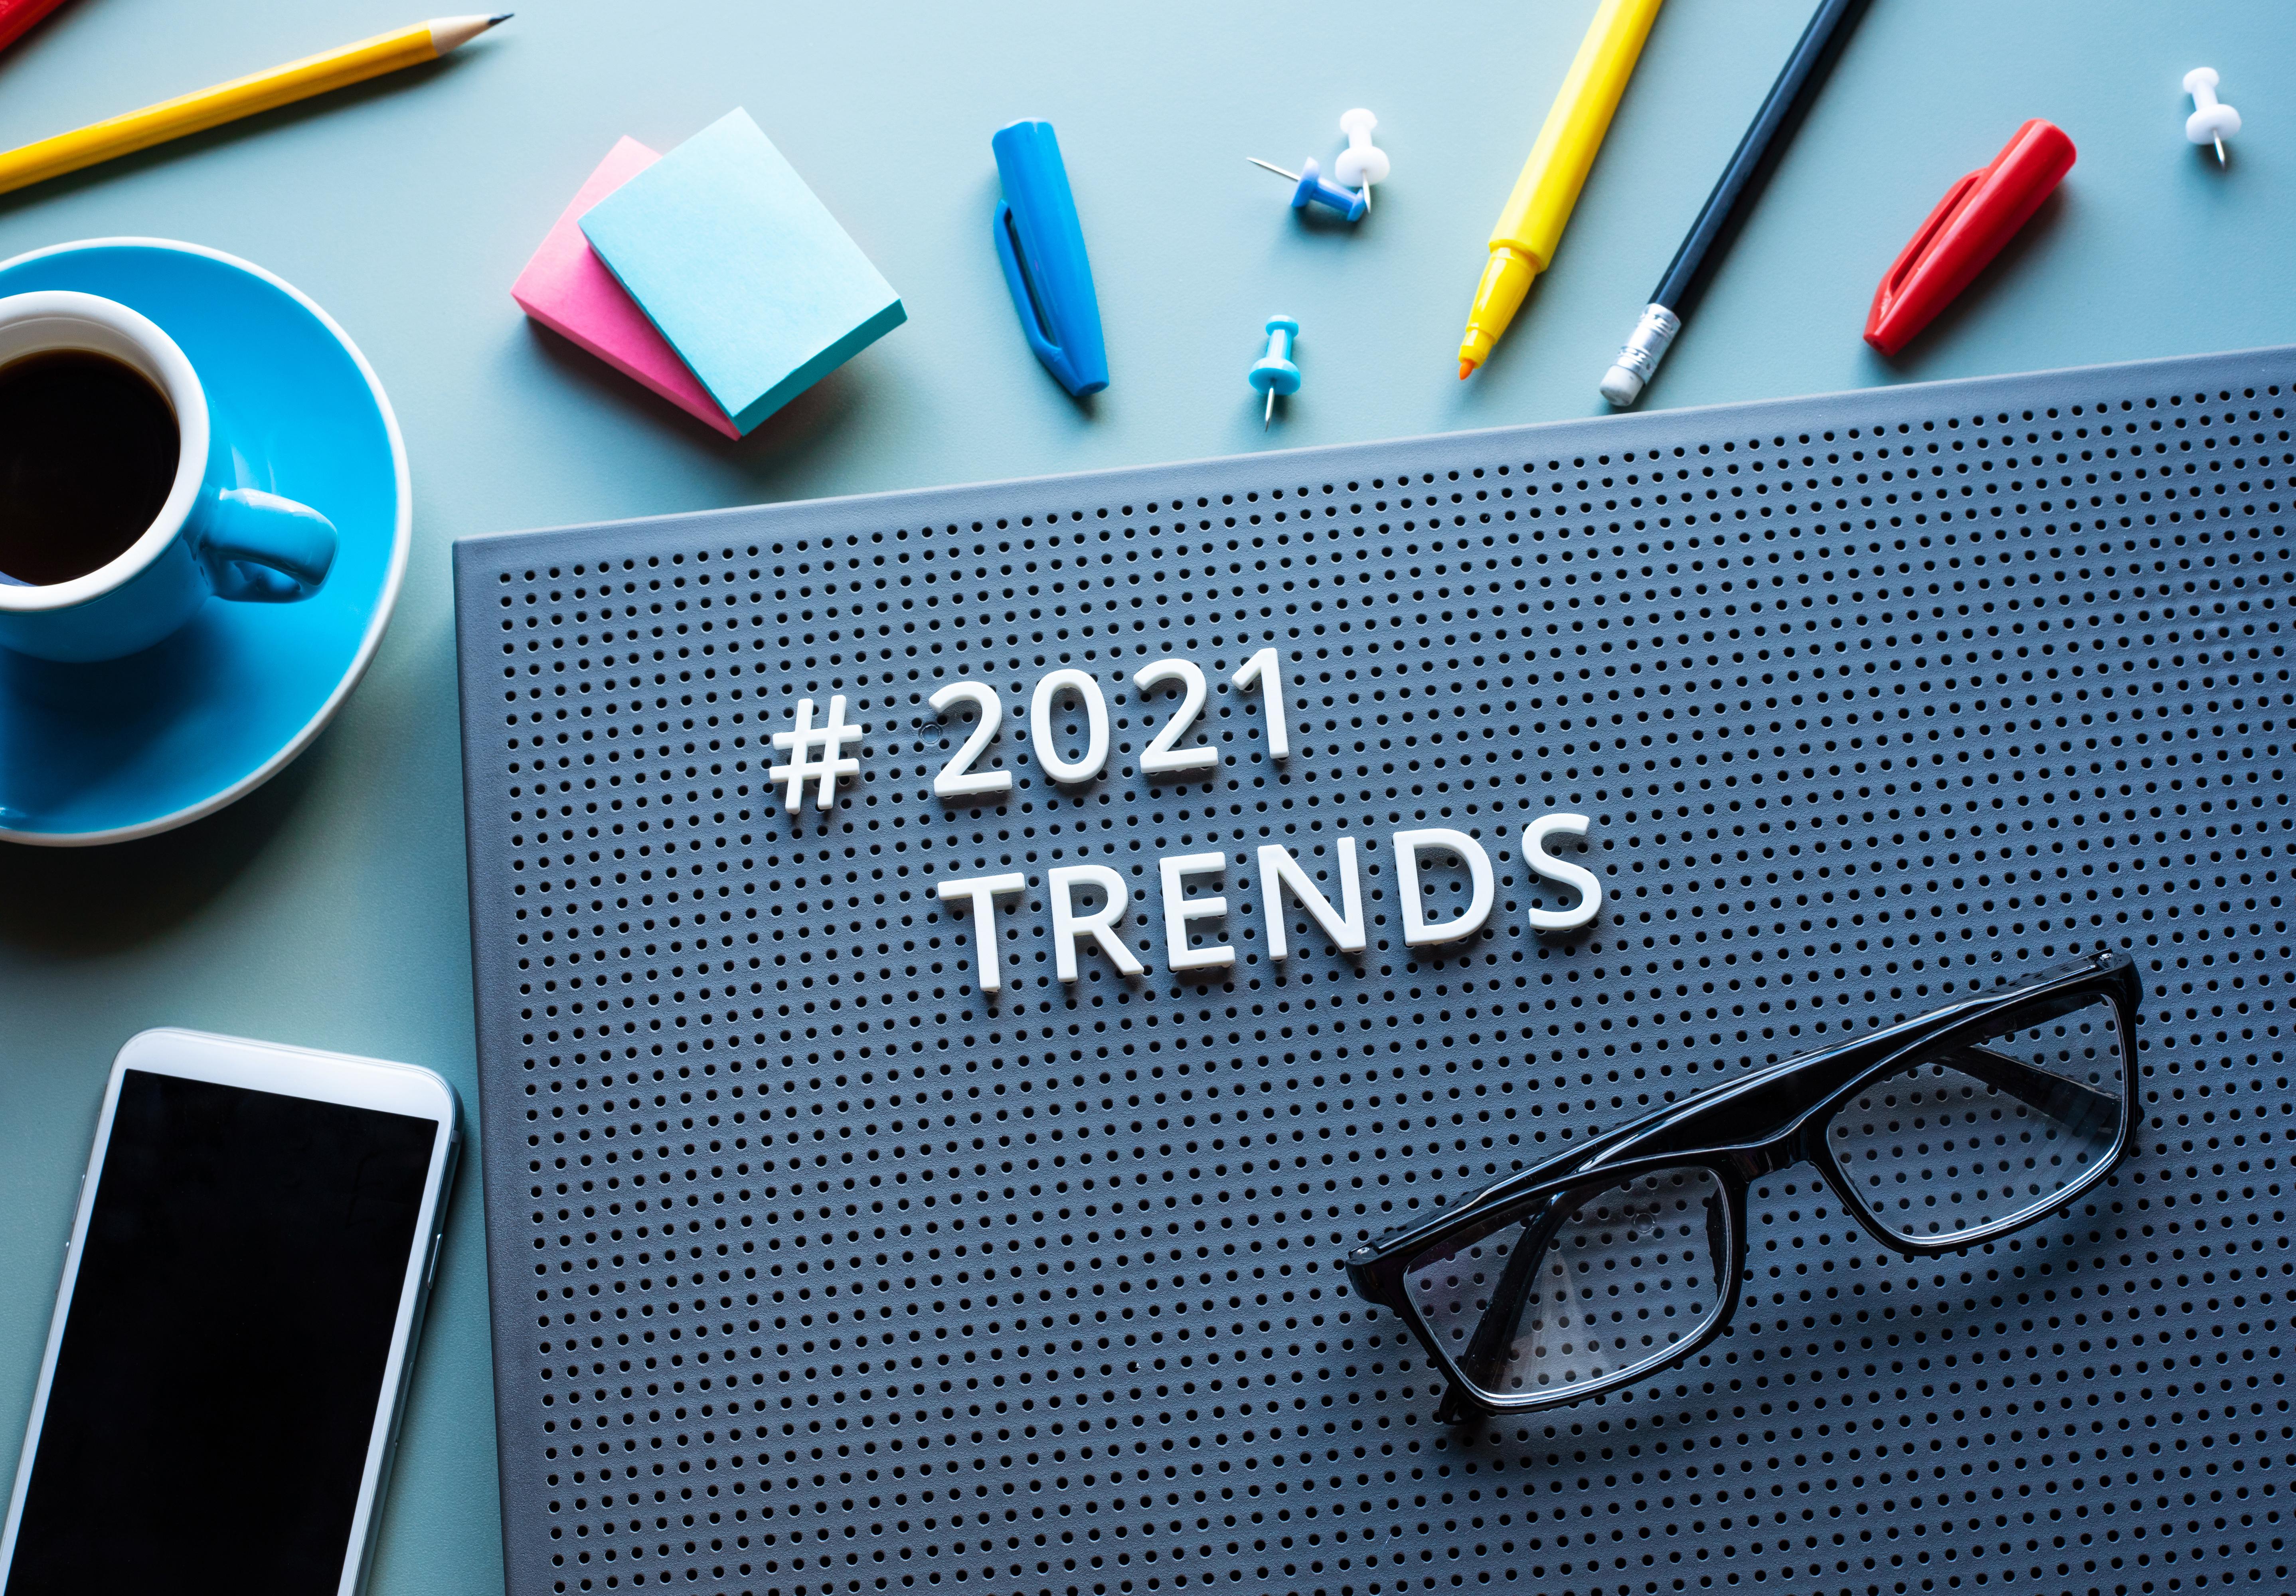 Awaiting Digital Marketing Trends In 2021